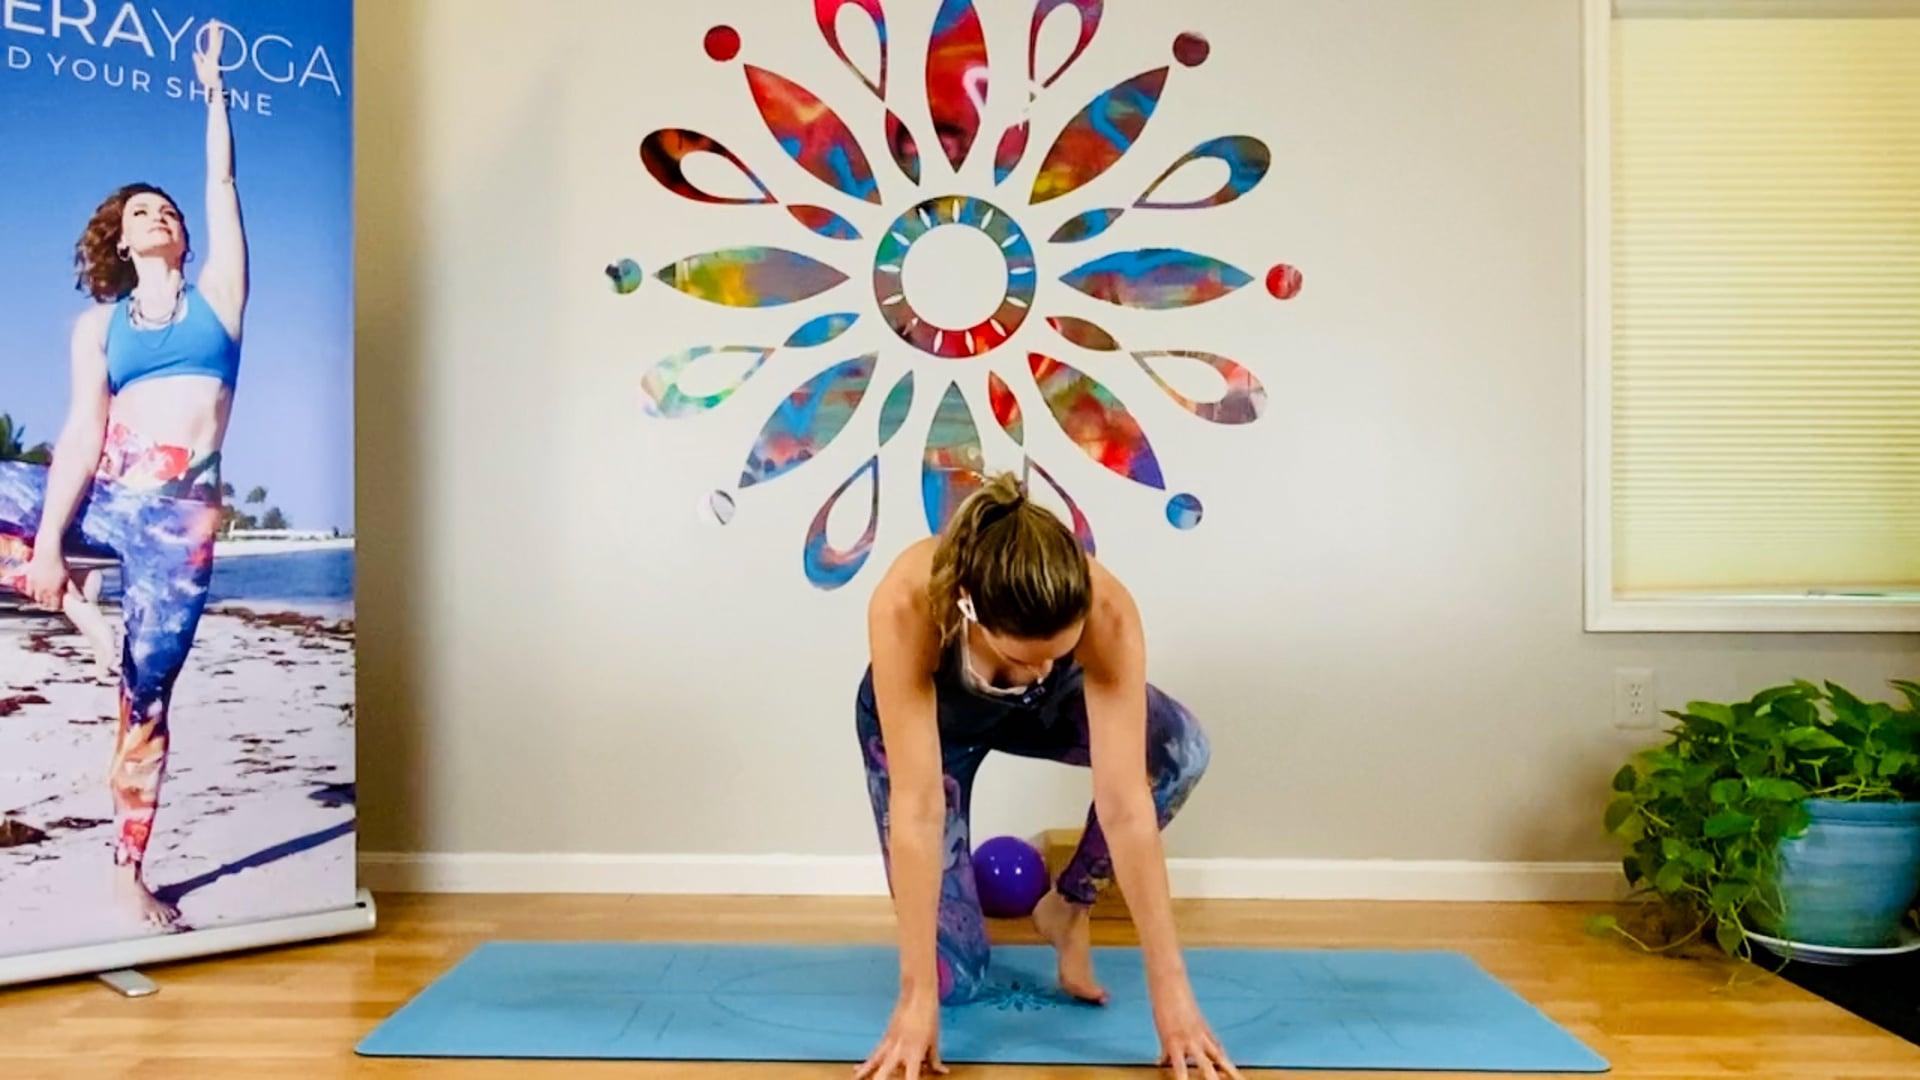 Nadi Method Shoulders & Neck 8-4-21 - 30 Minutes